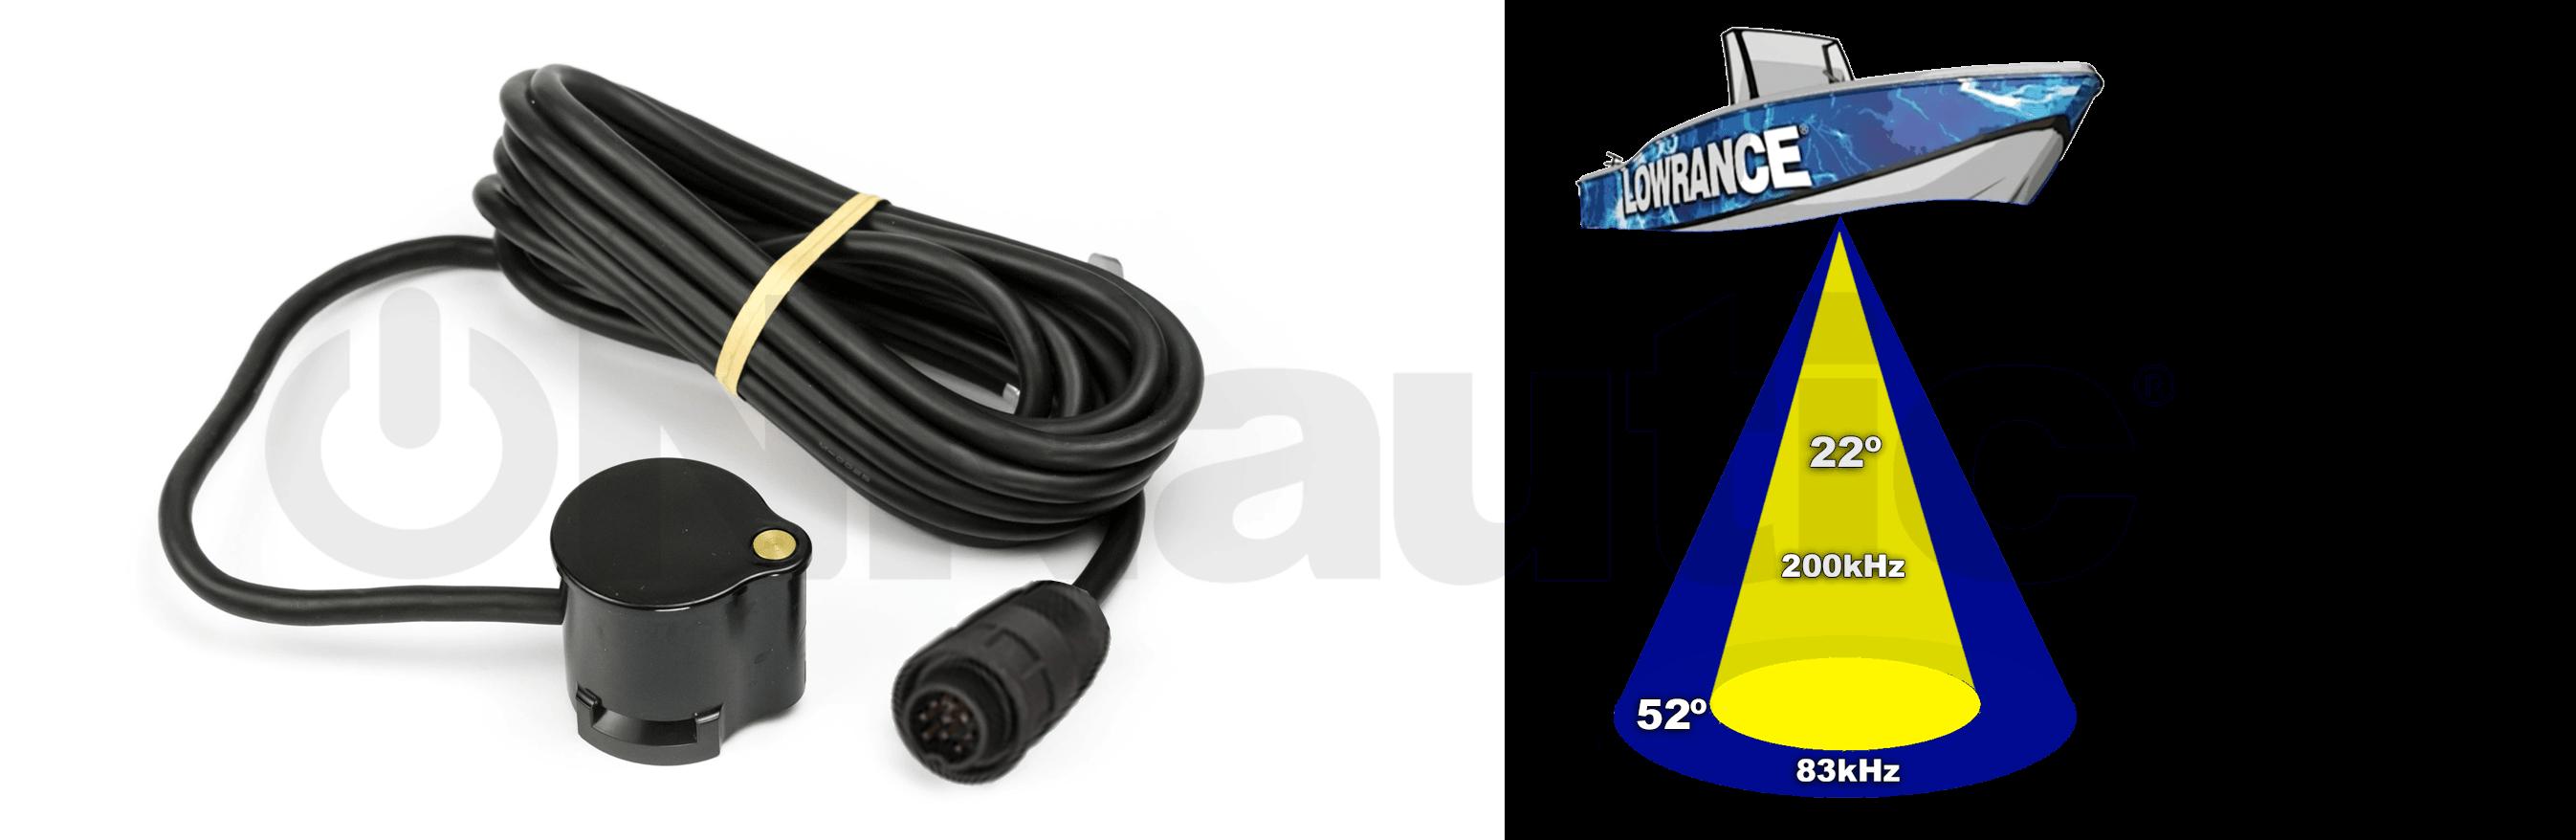 Lowrance 83-200 Transducer